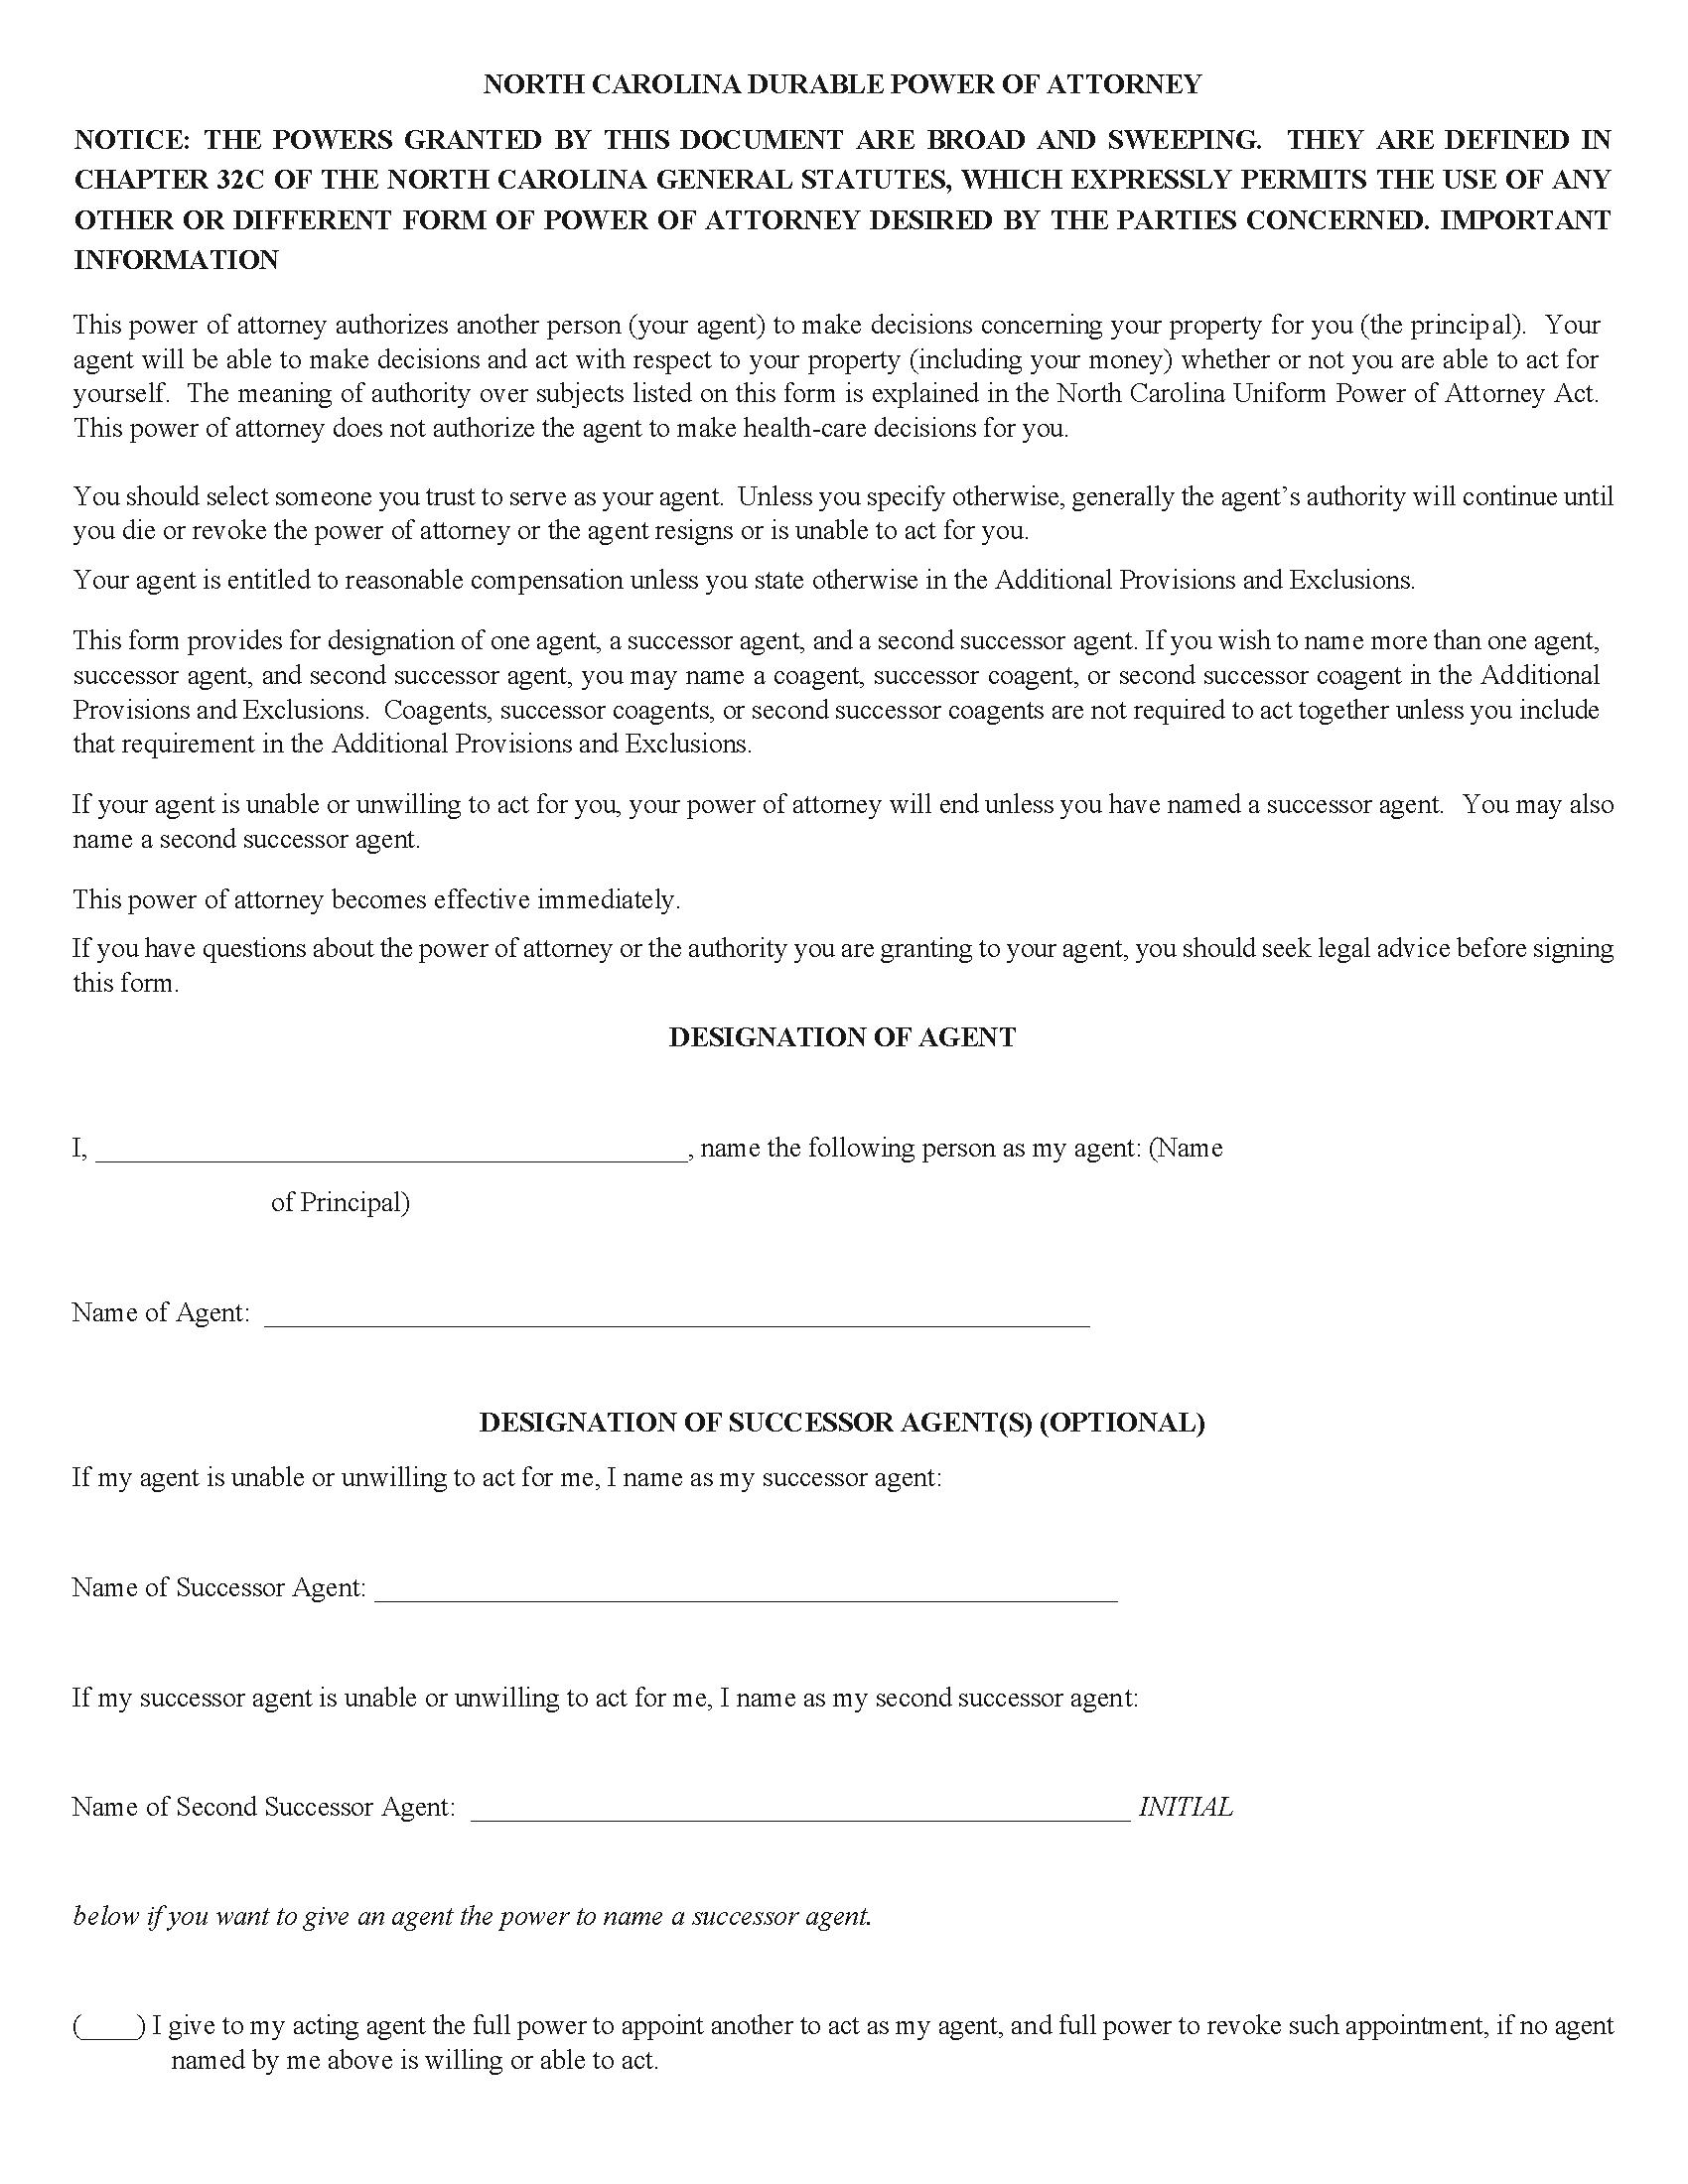 North Carolina Power of Attorney Form Free Printable